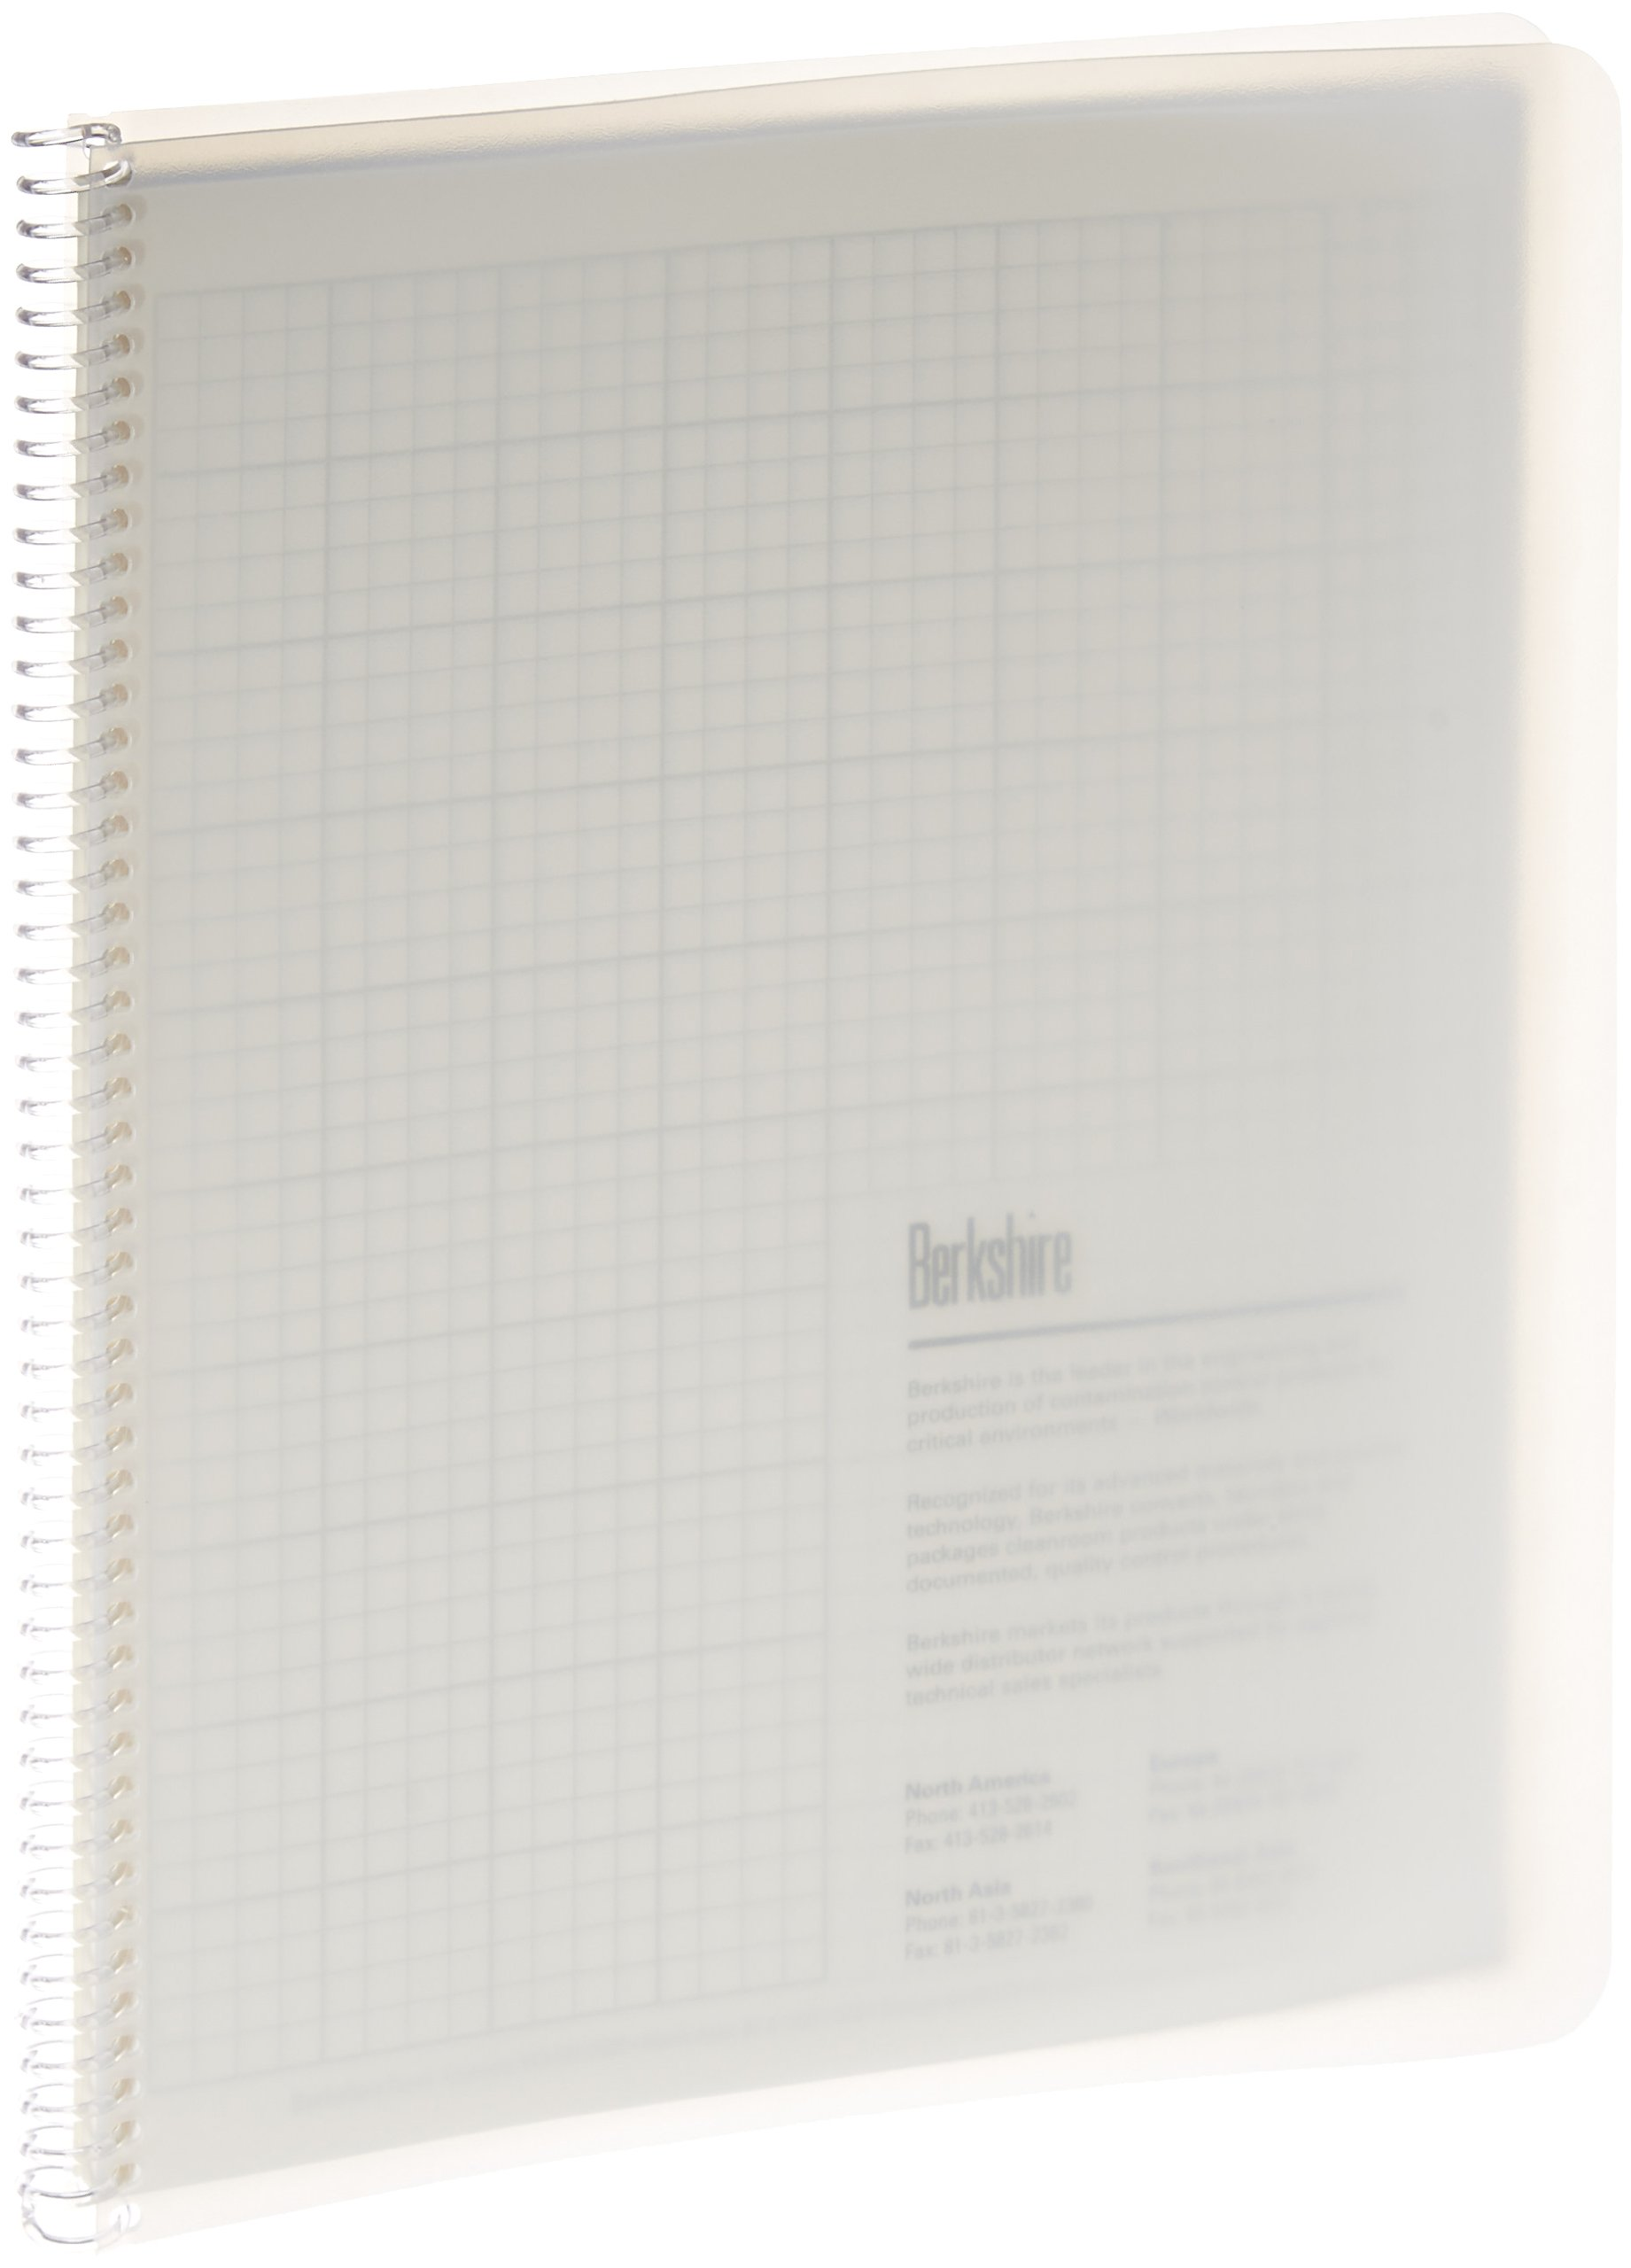 Berkshire BCR 1/4'' Grid Spiral Notebook, 8-1/2'' x 11'' (Case of 10 Packs)